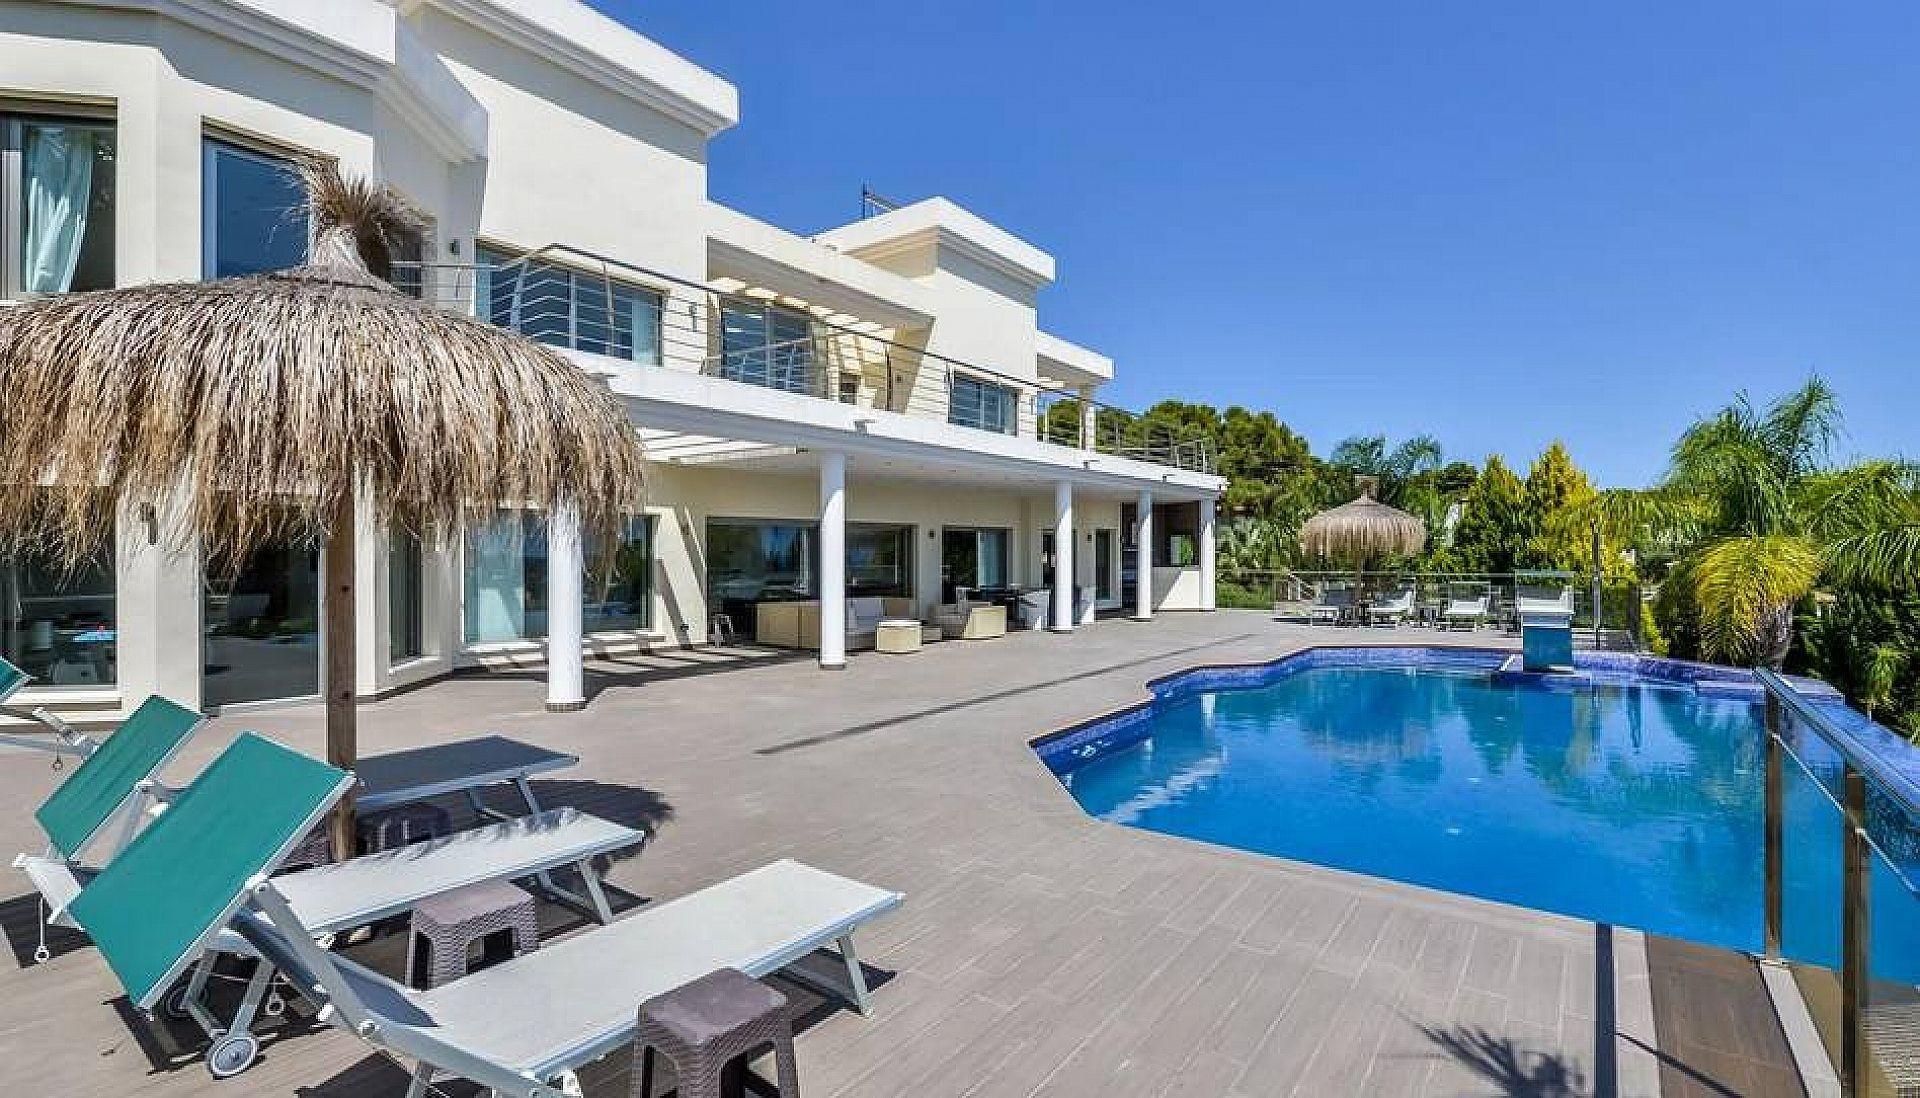 5 bedrooms, 2 pools, Seaview  - Max Villas